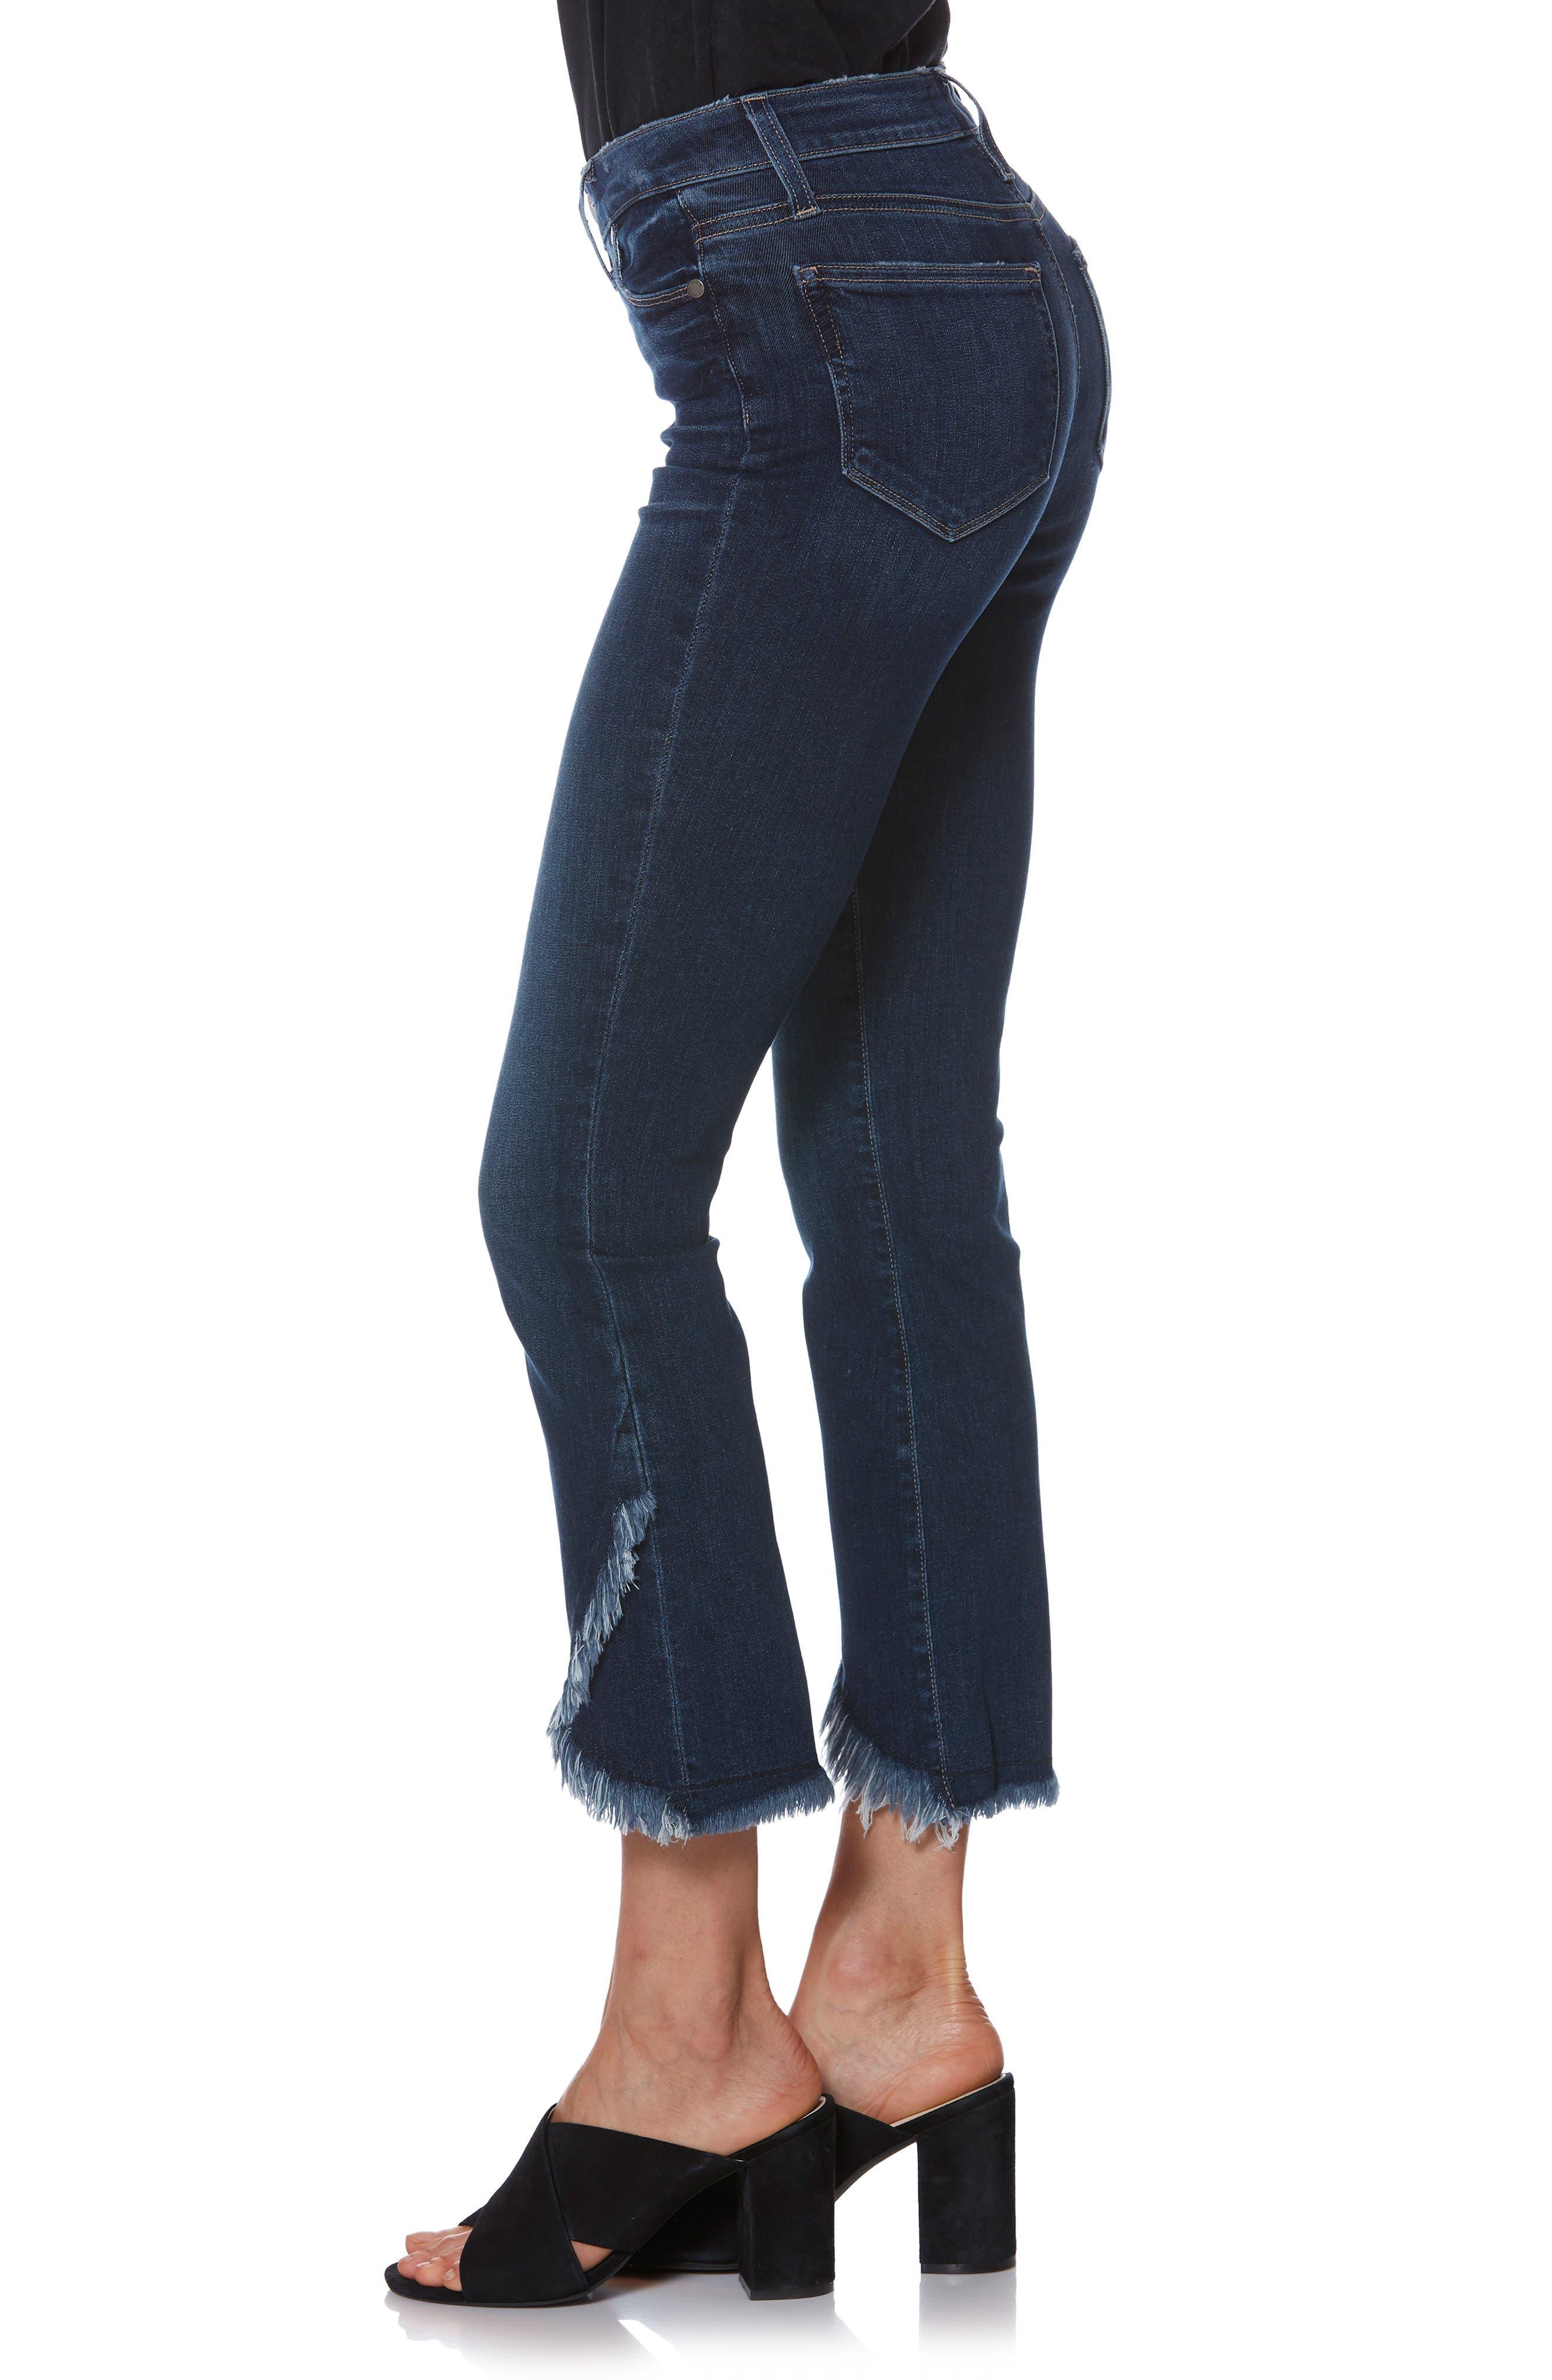 PAIGE,                             Transcend Vintage - Colette Frayed Crop Flare Jeans,                             Alternate thumbnail 3, color,                             PALMA